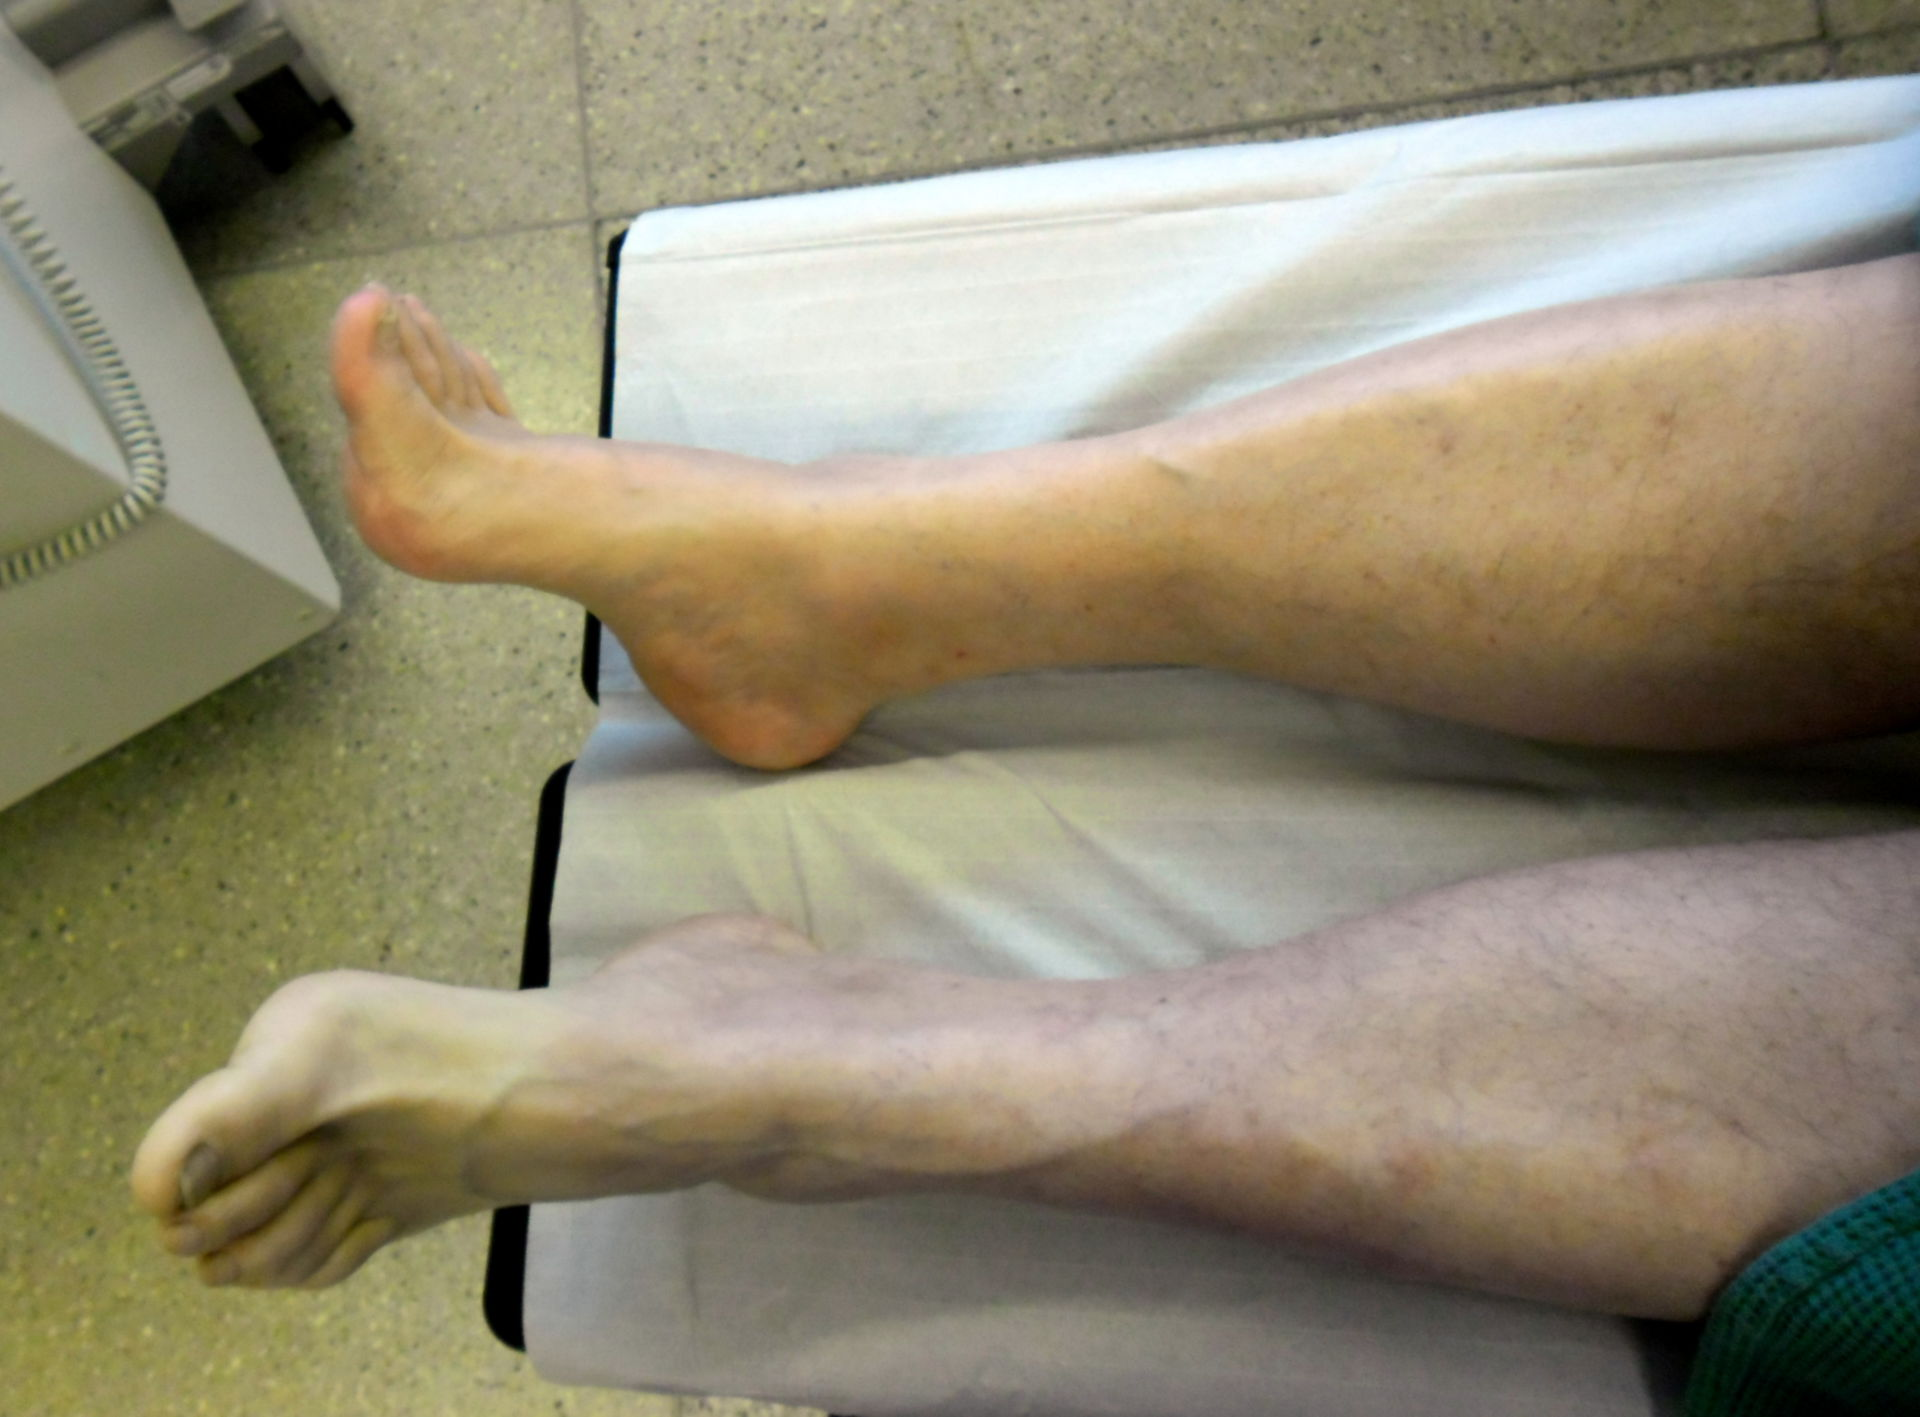 Embolia en la pierna izquierda